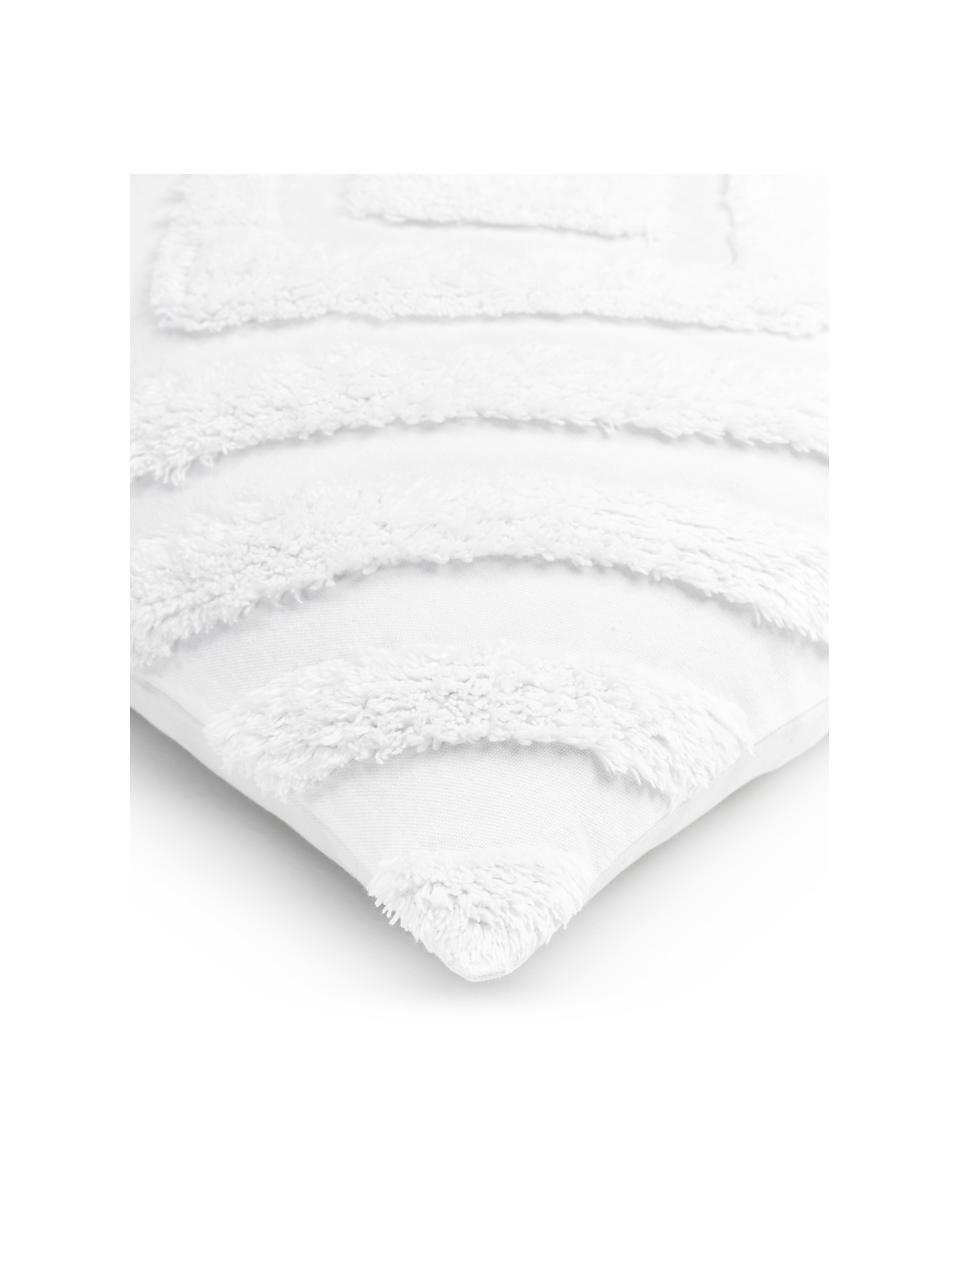 Housse de coussin 50x50 Kara, Blanc